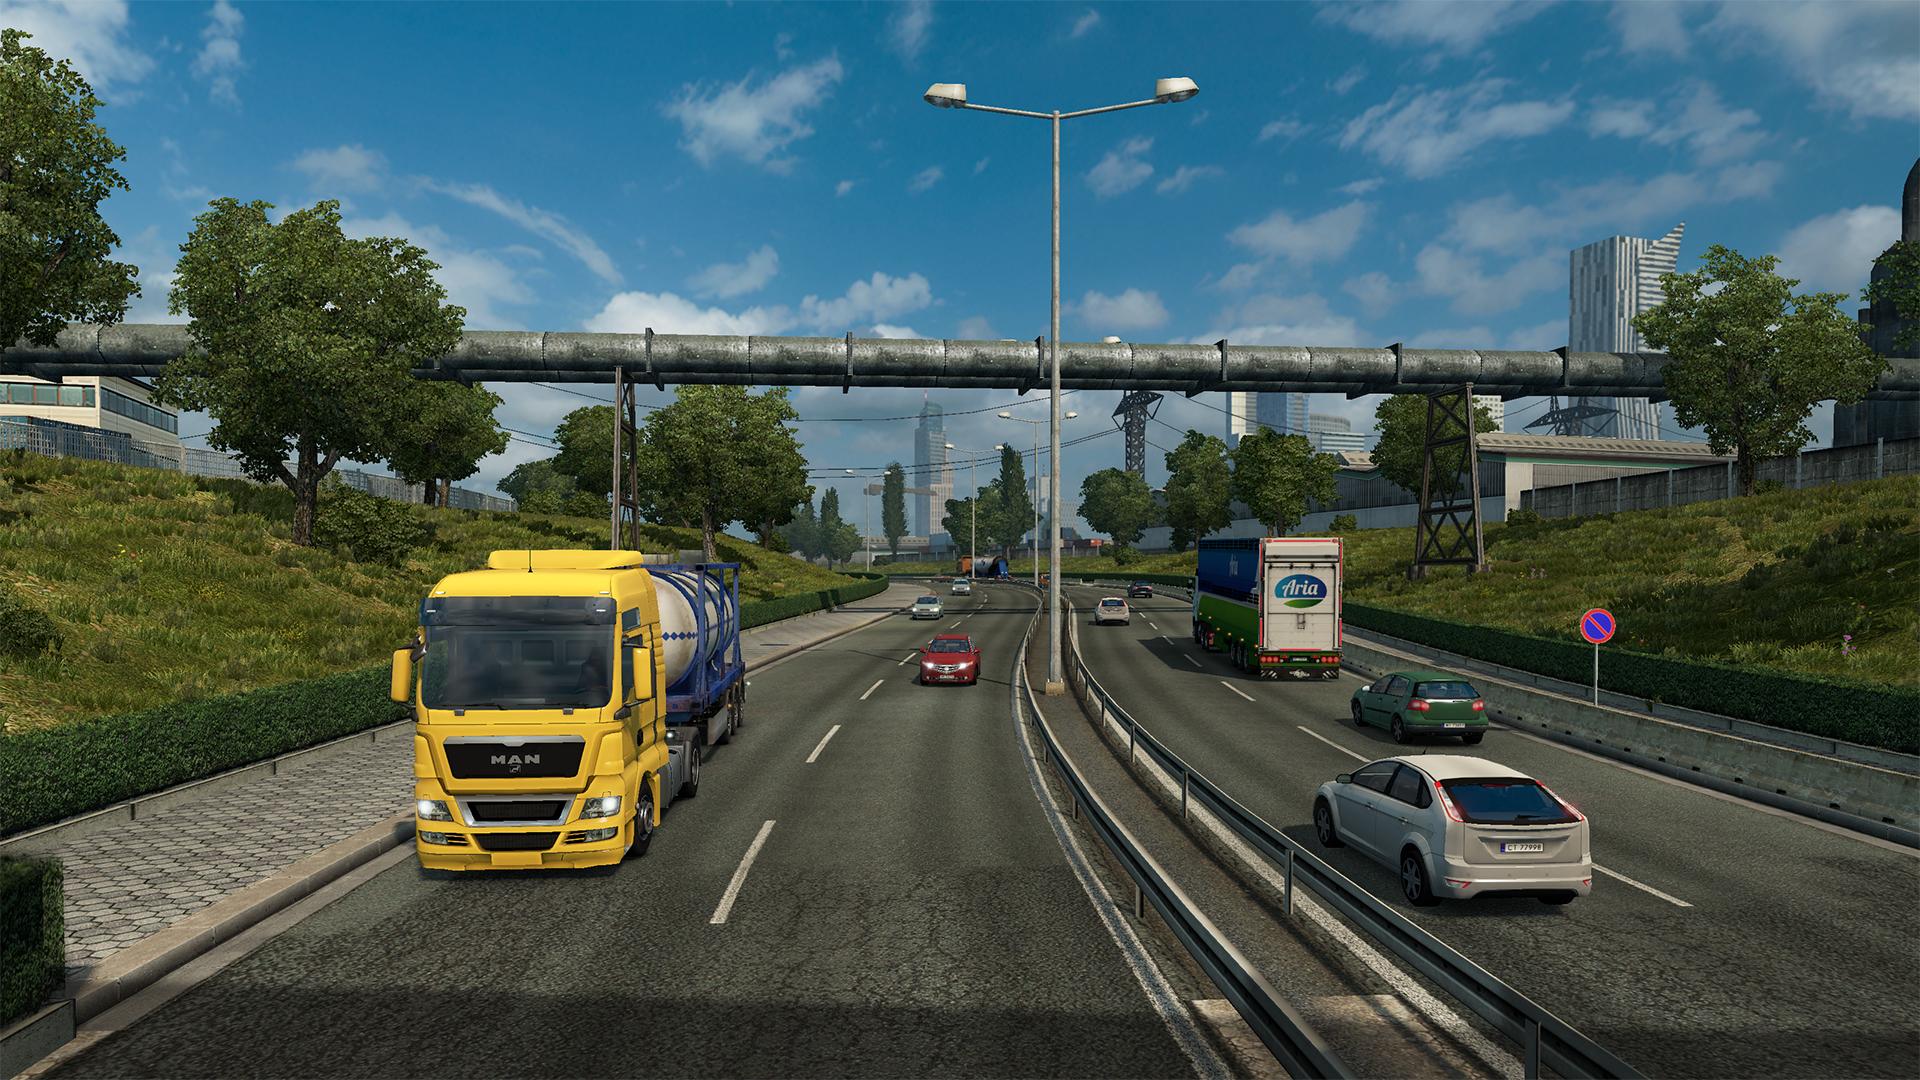 Ключик на Euro Truck Simulator 2. ... Euro Truck Simulator 2 - Каталог файлов -  BeamNG DRIVE,Spin Tires,Farming Simulator 2013,ETS-2 modsgaming.ru. 83.